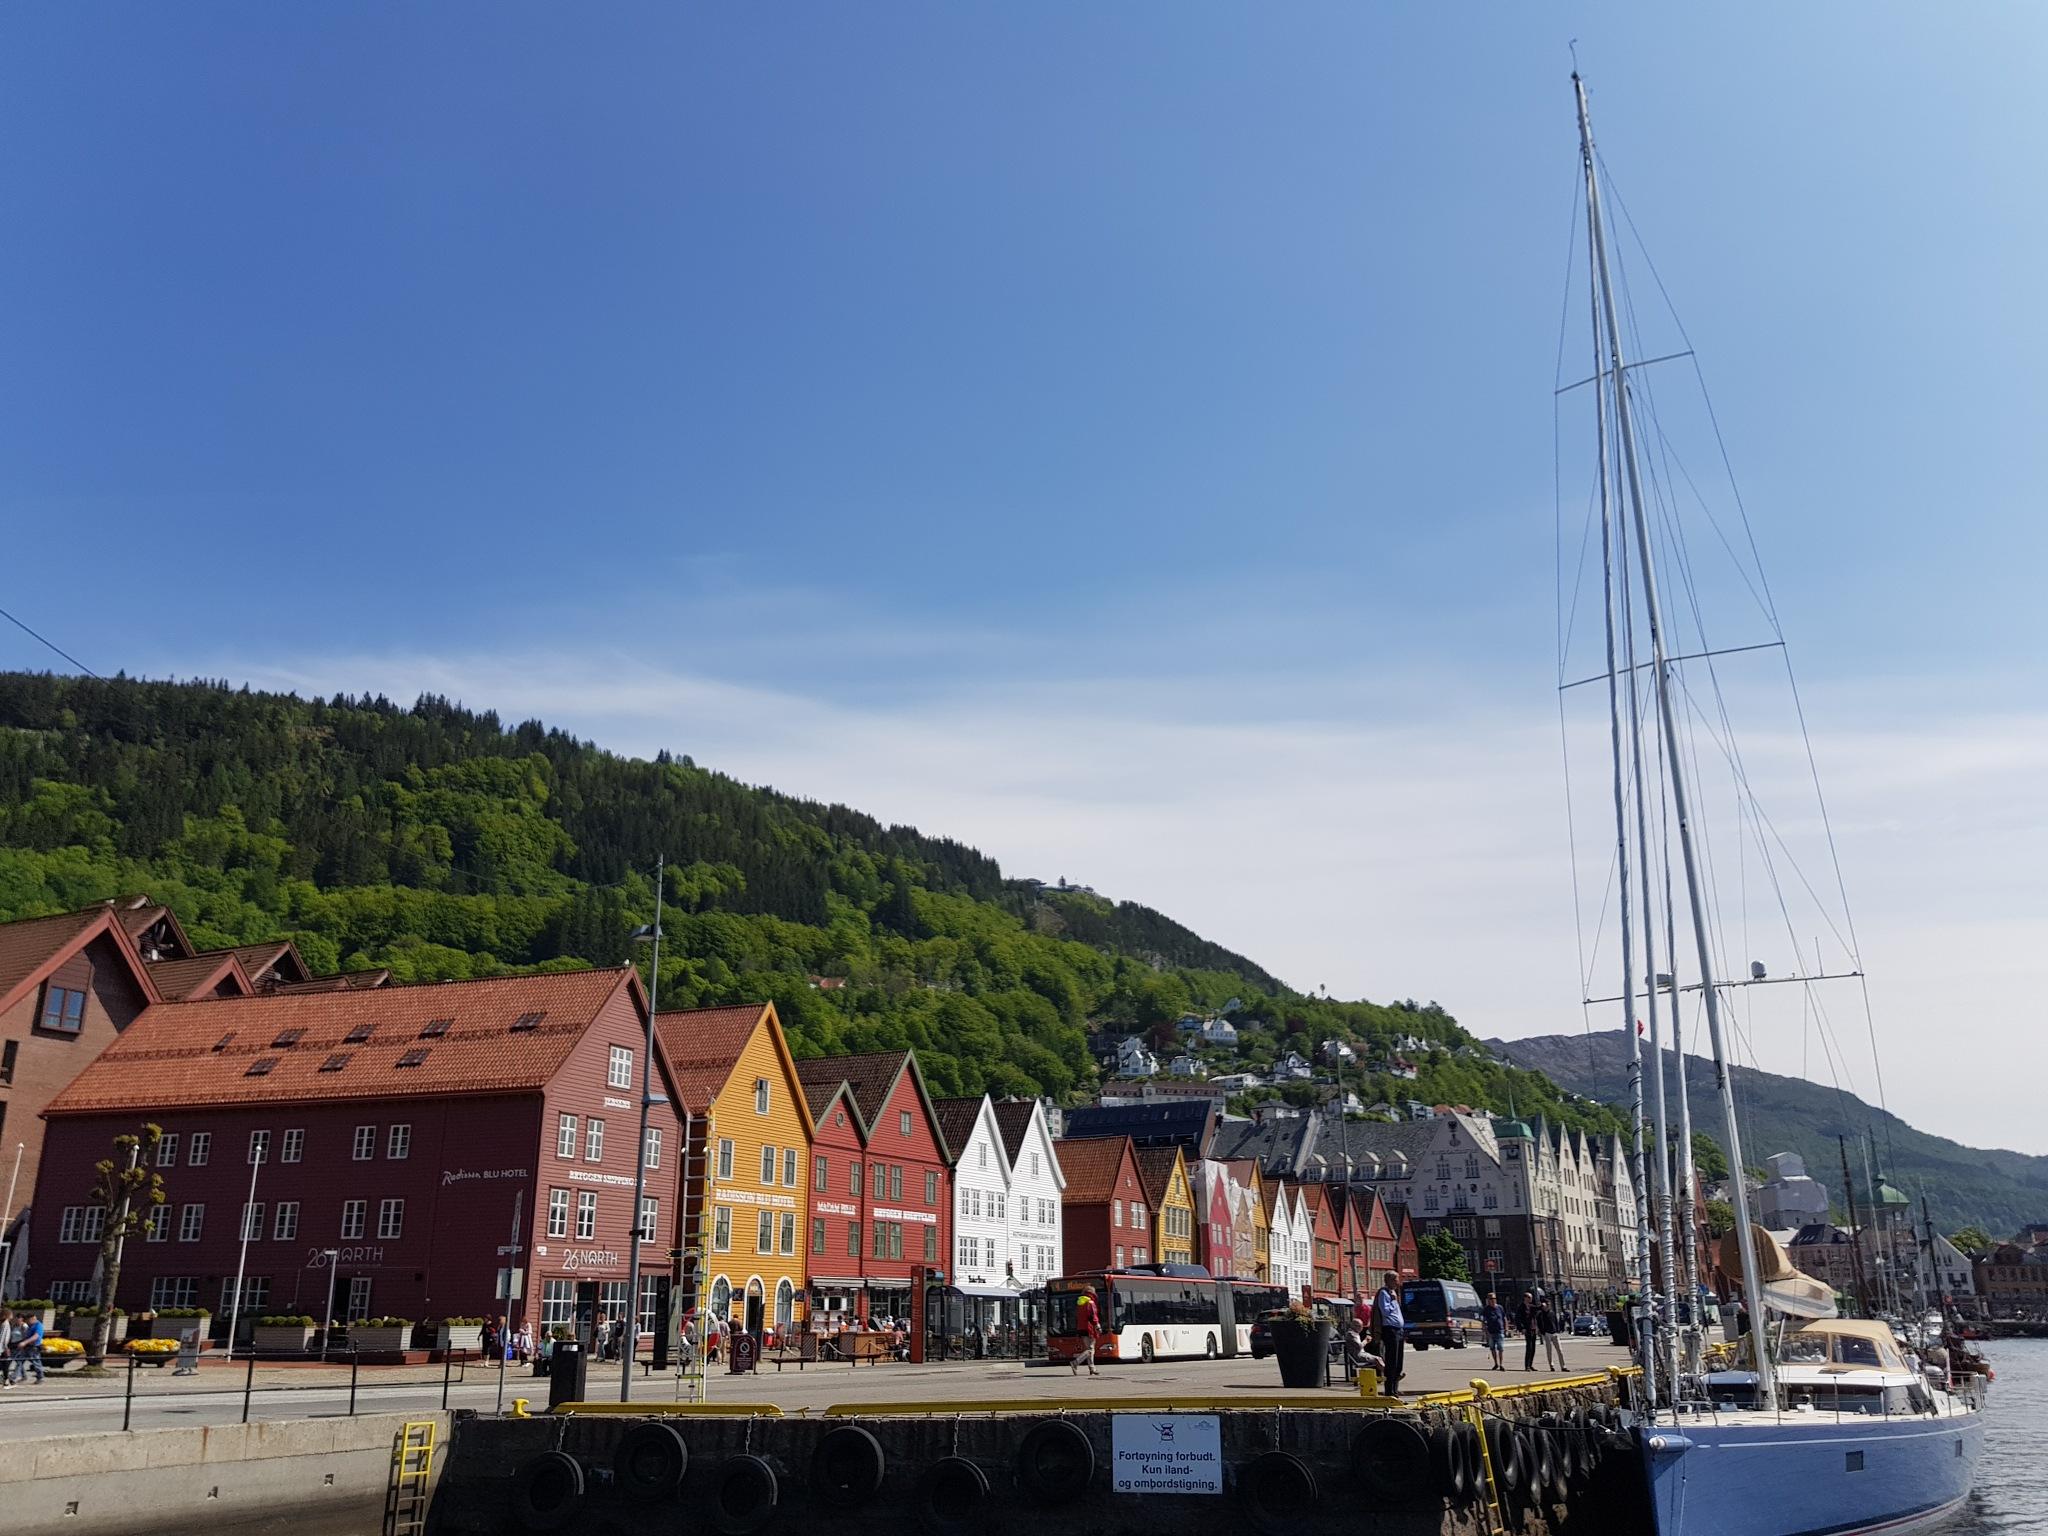 BRYGGEN IN BERGEN Norway  by Frode helland